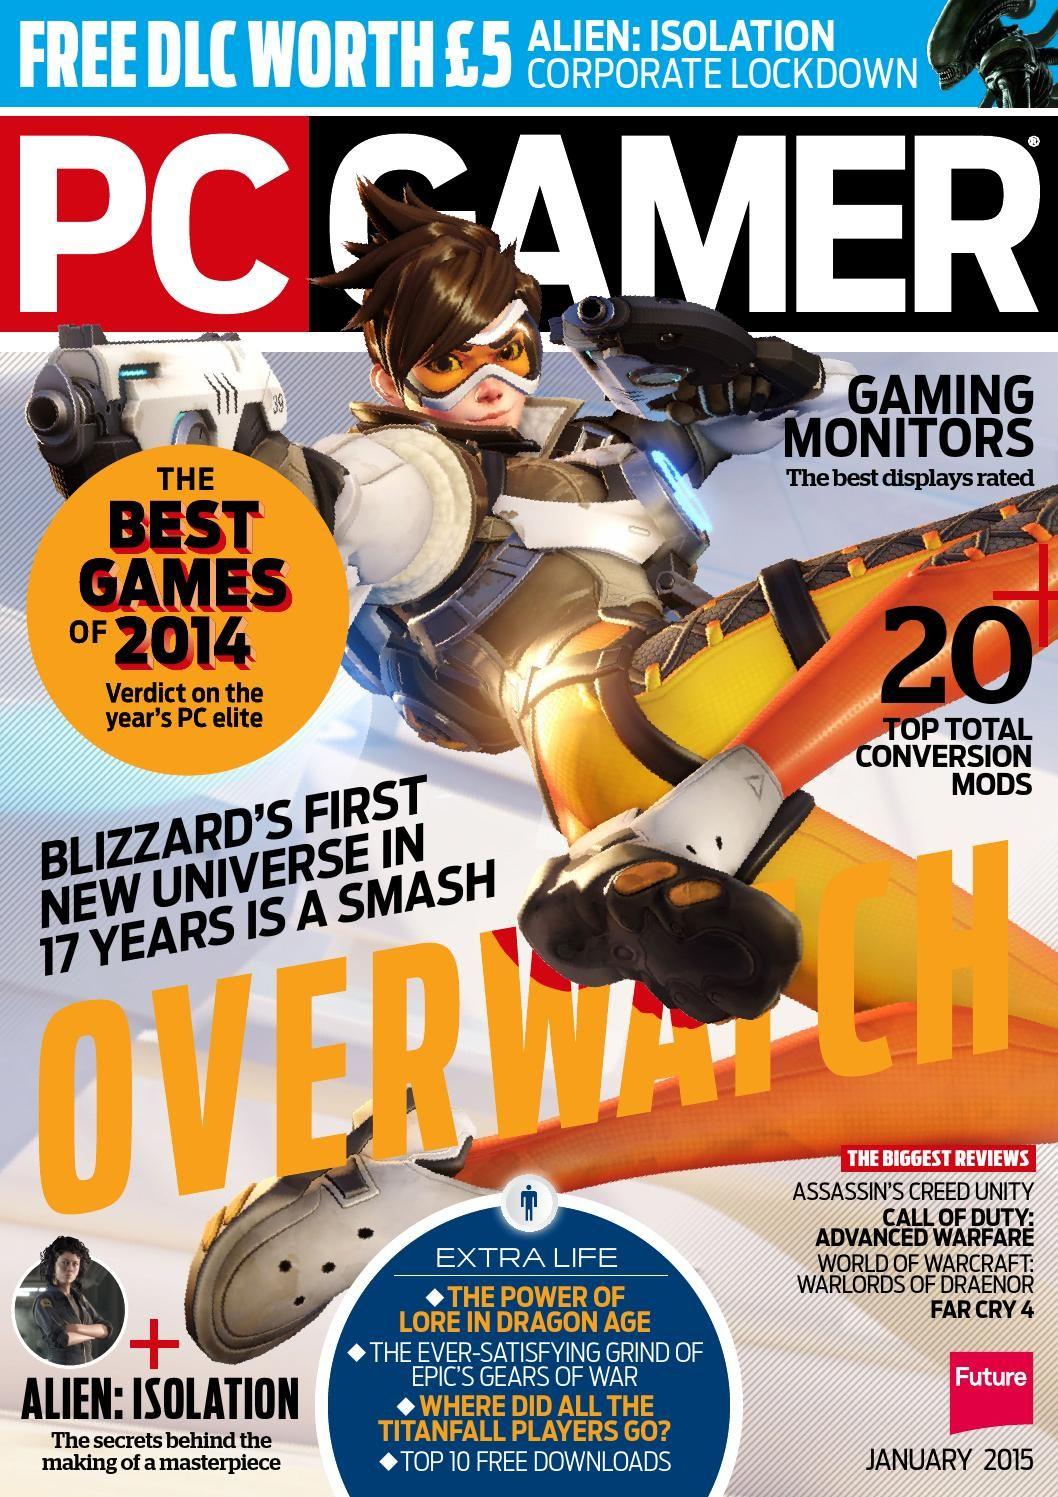 PC Gamer 274 Sampler | MAGAZINES | Pc gamer magazine, Pc